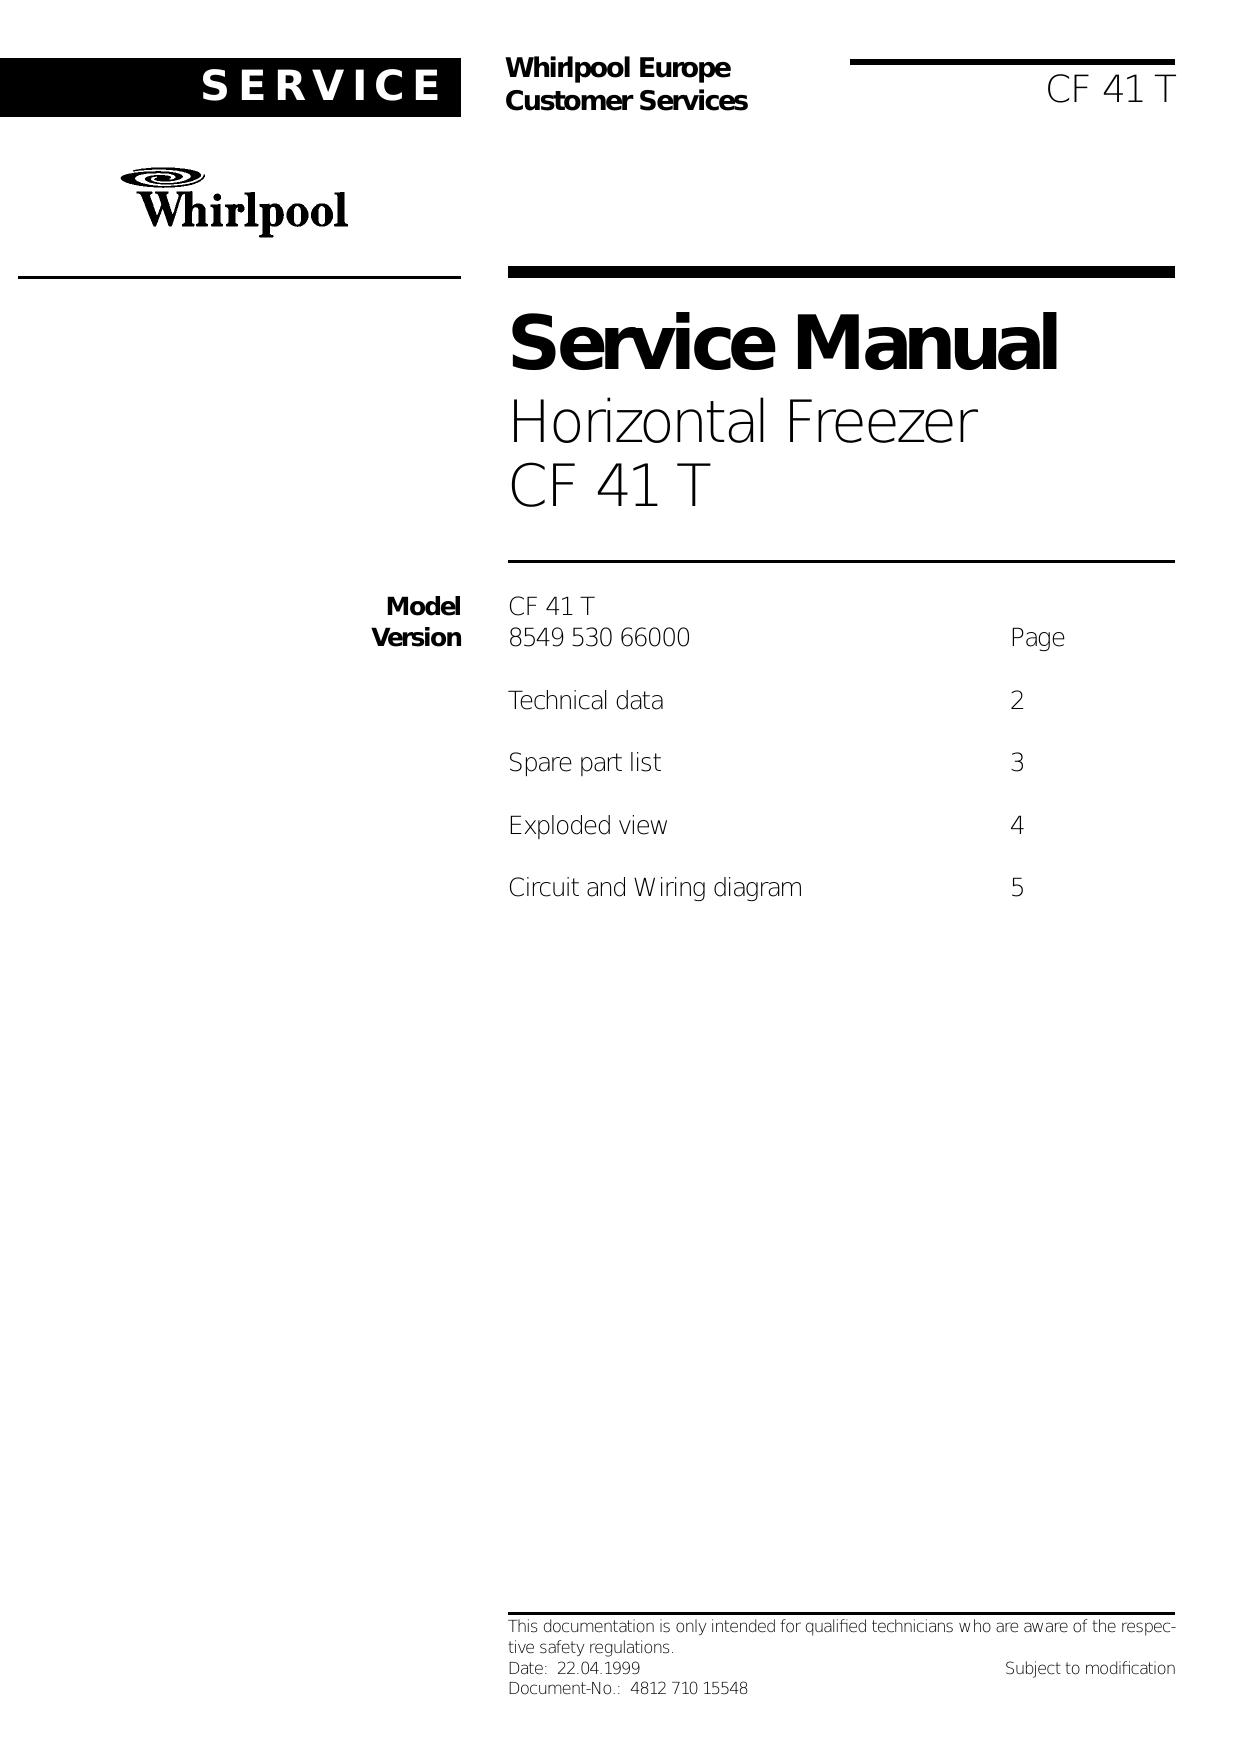 whirlpool freezer wiring diagram whirlpool freezer 41 user manual manualzz  whirlpool freezer 41 user manual manualzz